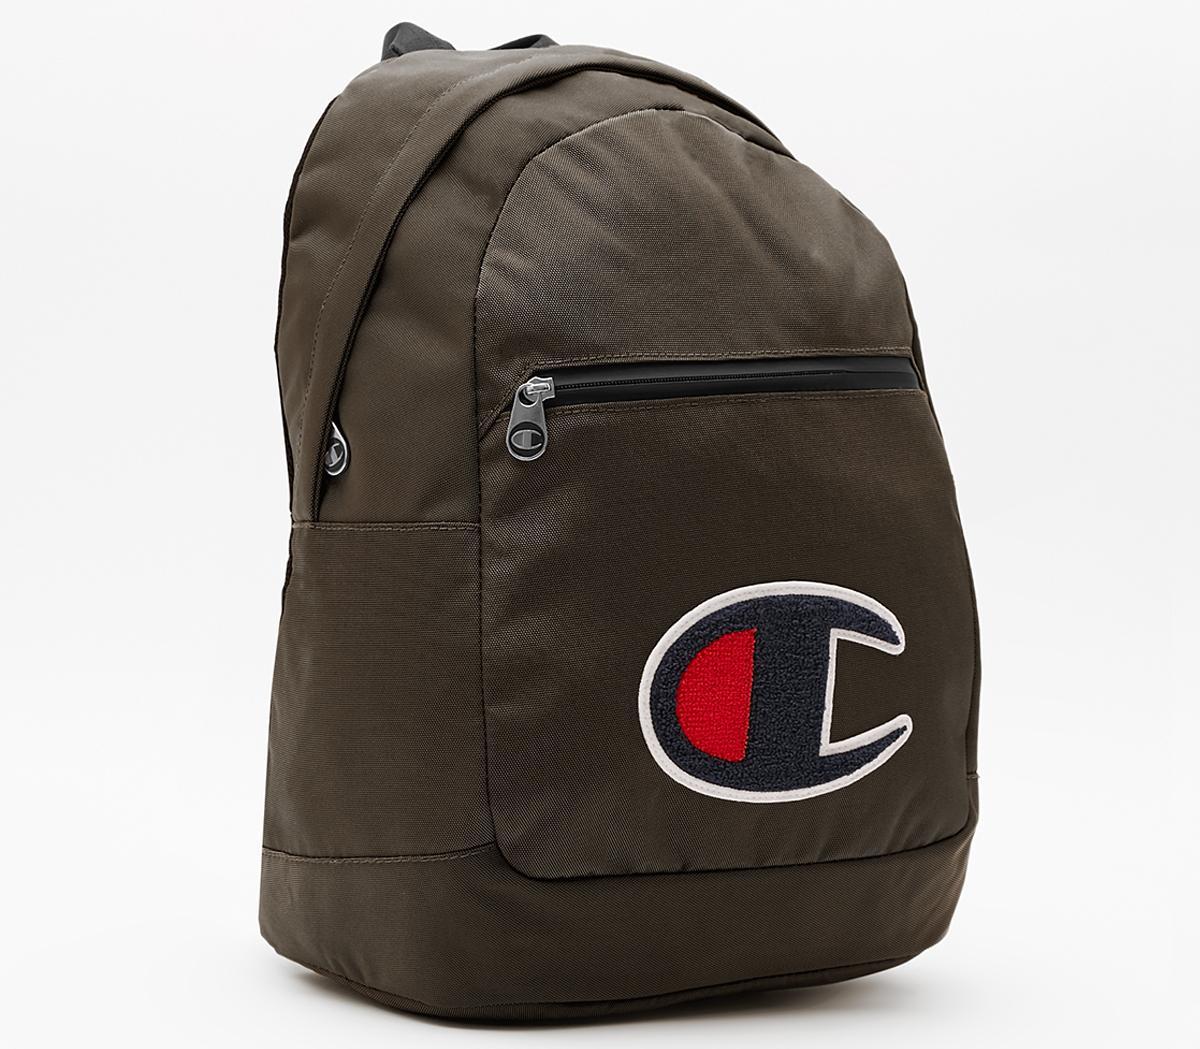 Rochester Backpack